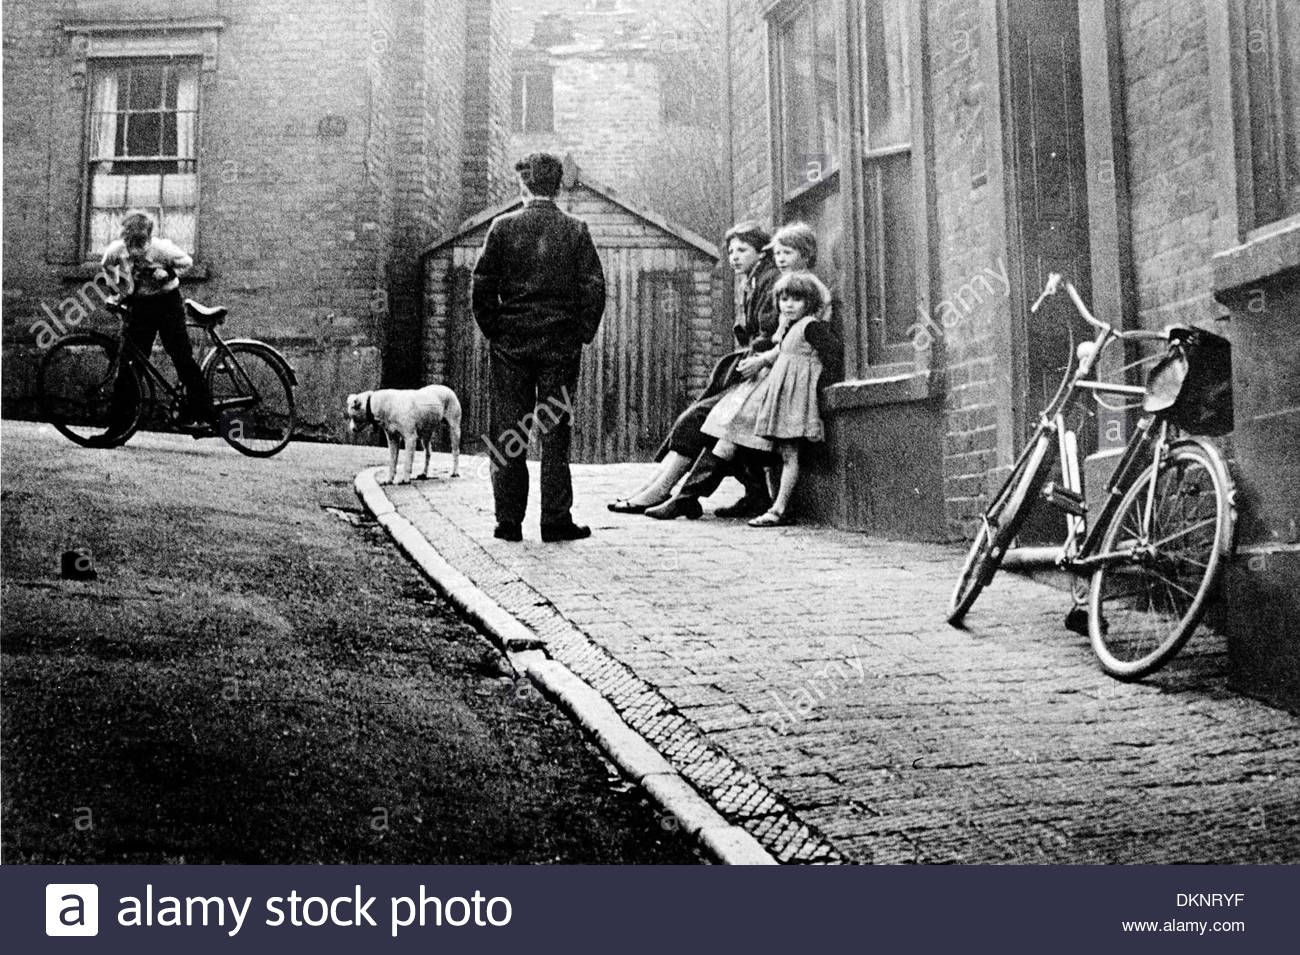 Tinchborne Street, Dudley, 1955